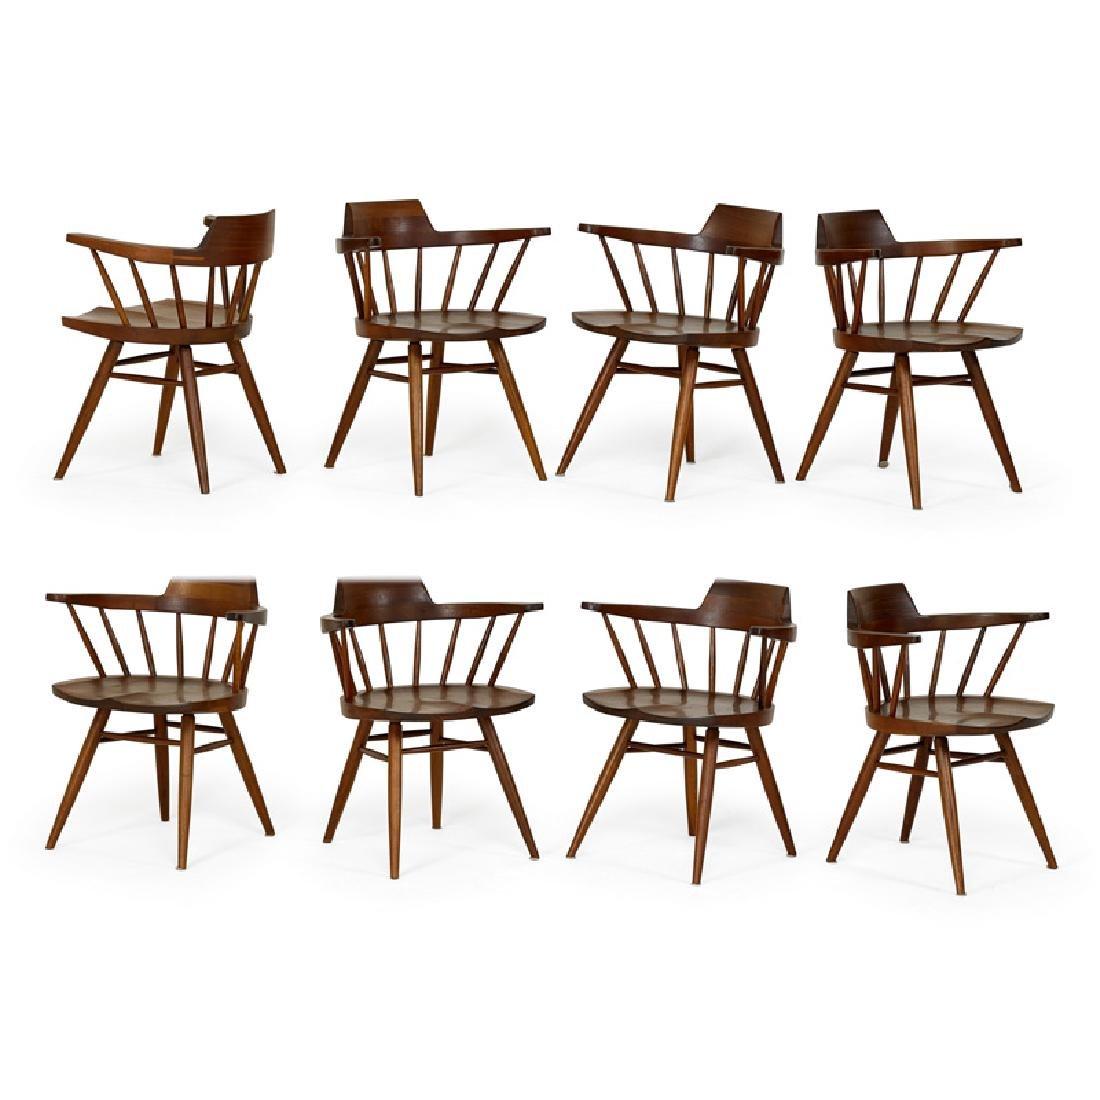 GEORGE NAKASHIMA Eight Captain's chairs